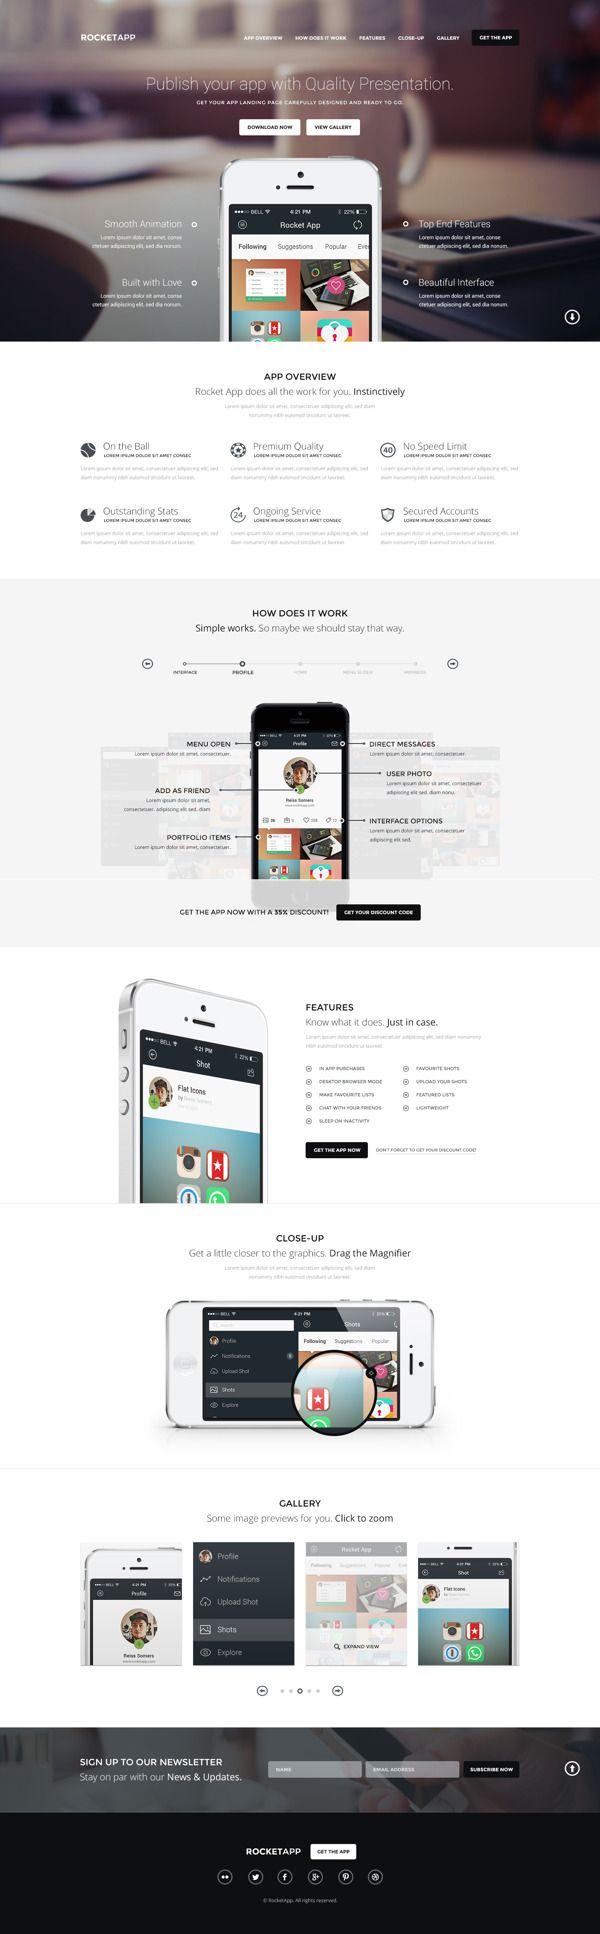 PSD Template - RocketApp Responsive App Landing Page